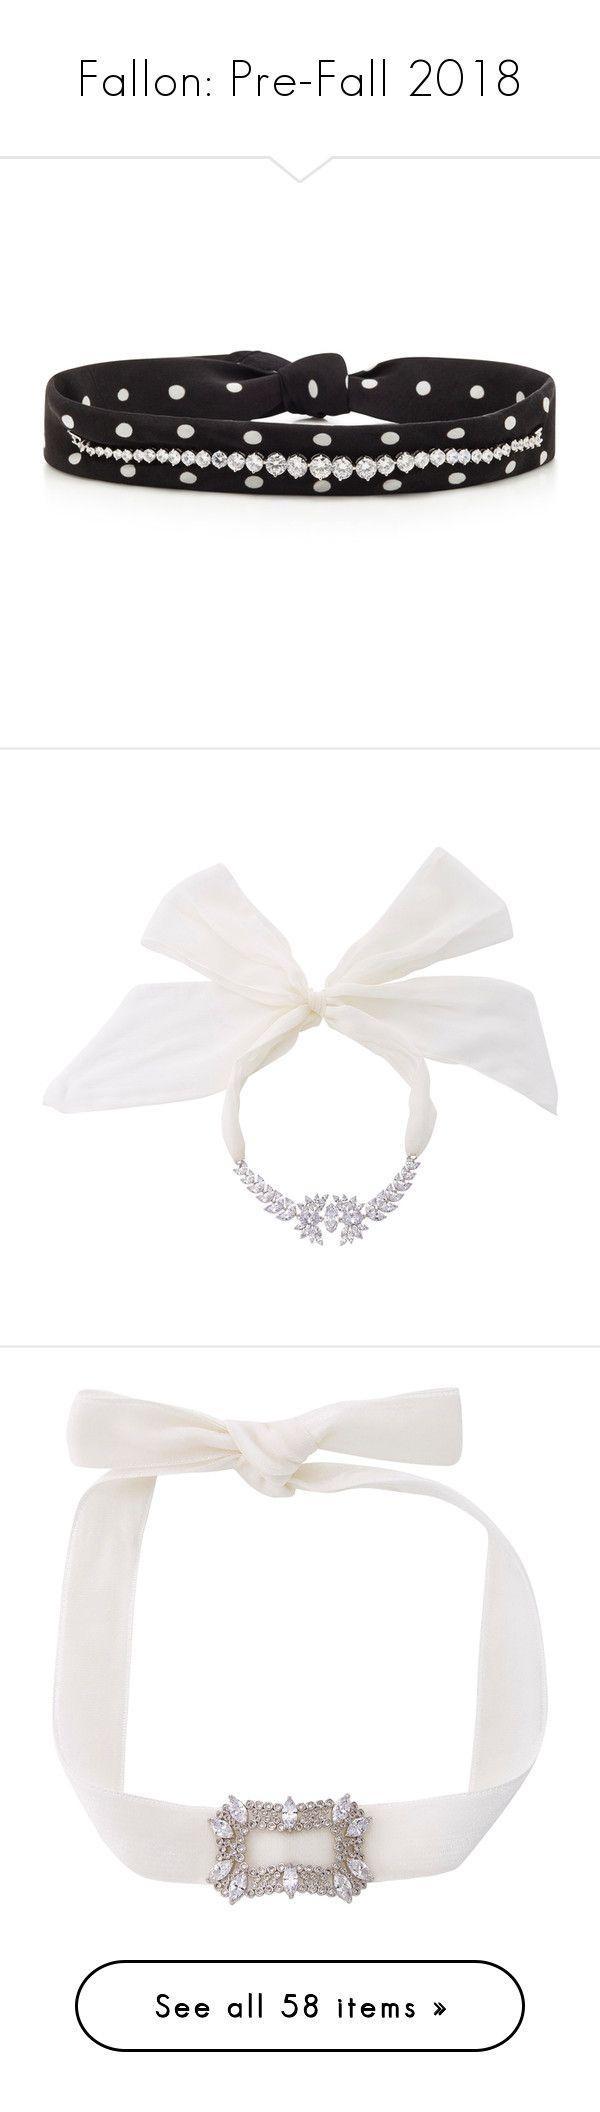 """Fallon: Pre-Fall 2018"" by livnd ❤ liked on Polyvore featuring jewelry, fallon, livndjewelry, prefall2018, livndfallon, necklaces, multi, layered jewelry, silk choker and silk choker necklace"